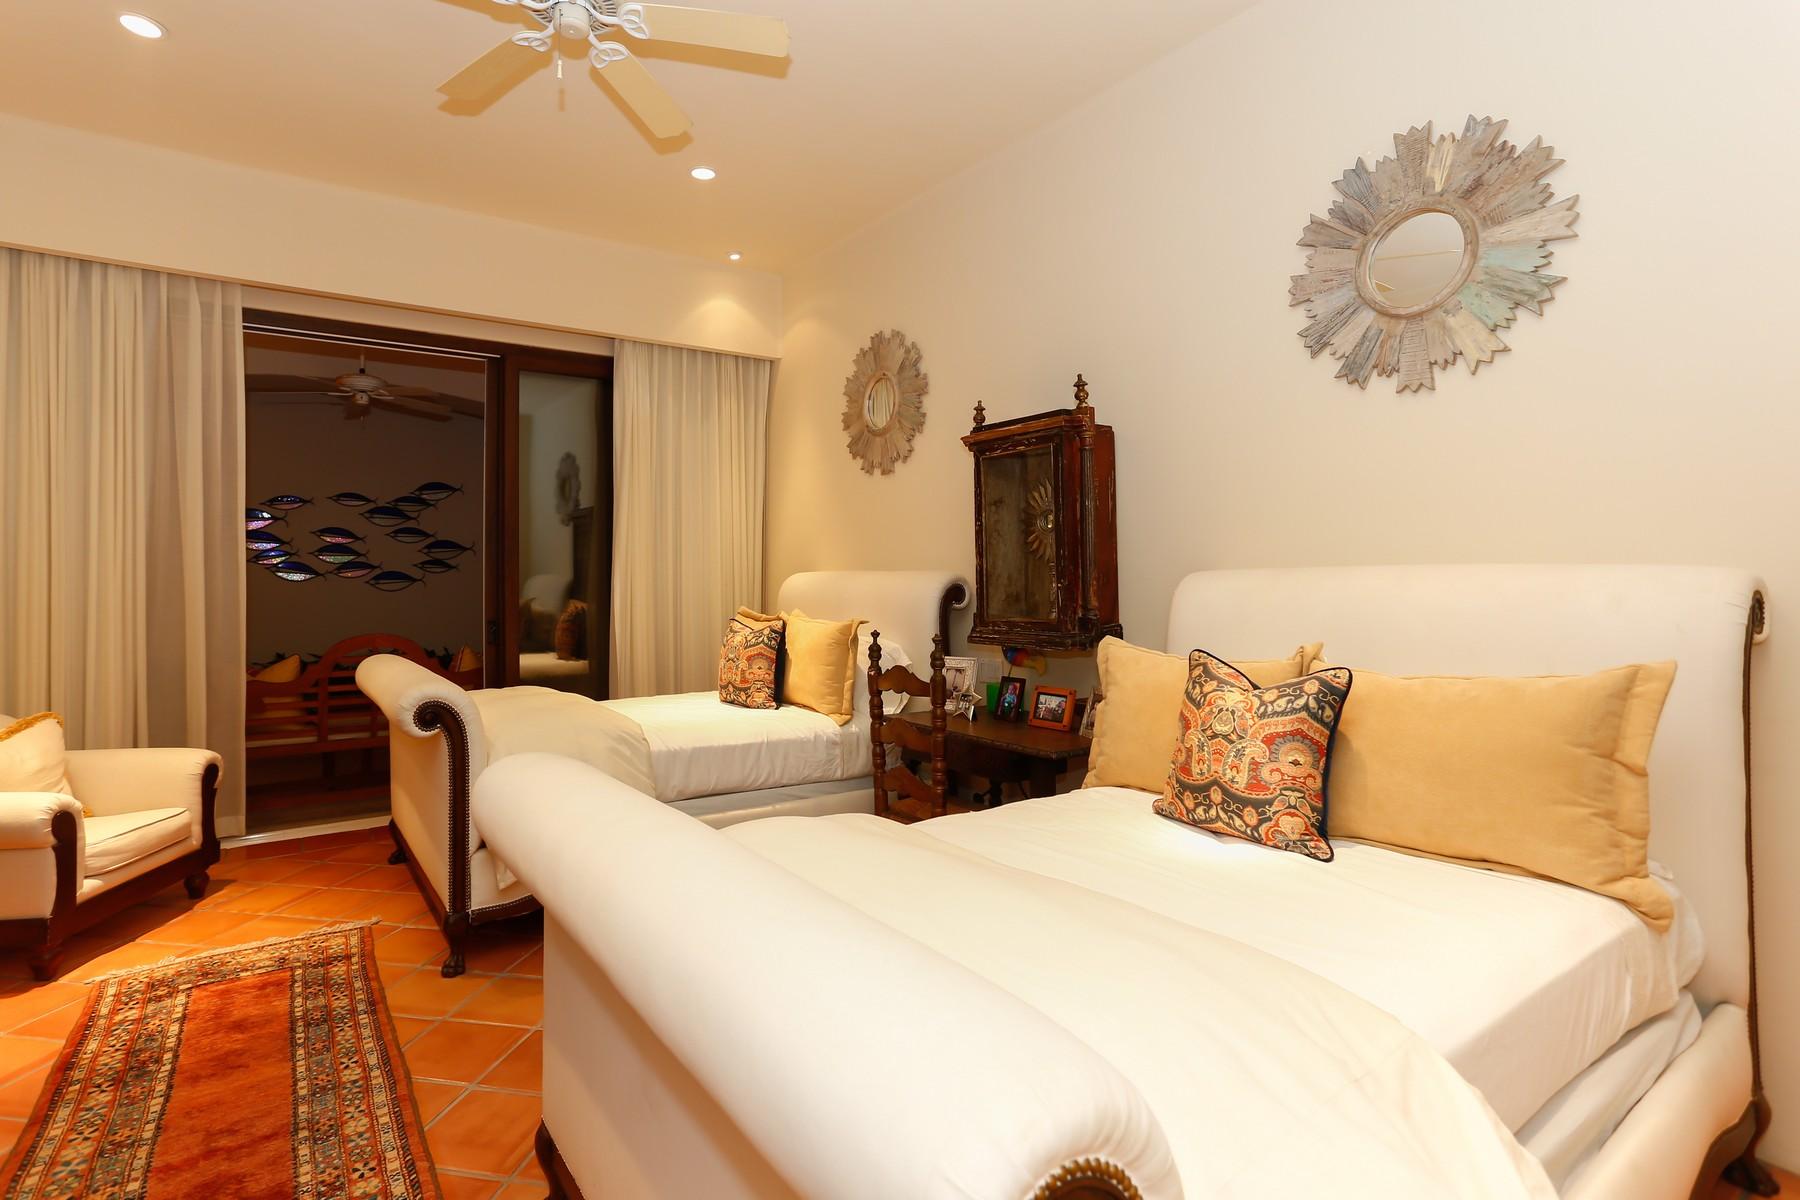 Additional photo for property listing at Villa de la Playa San Jose Del Cabo, Baja California Sur Mexico